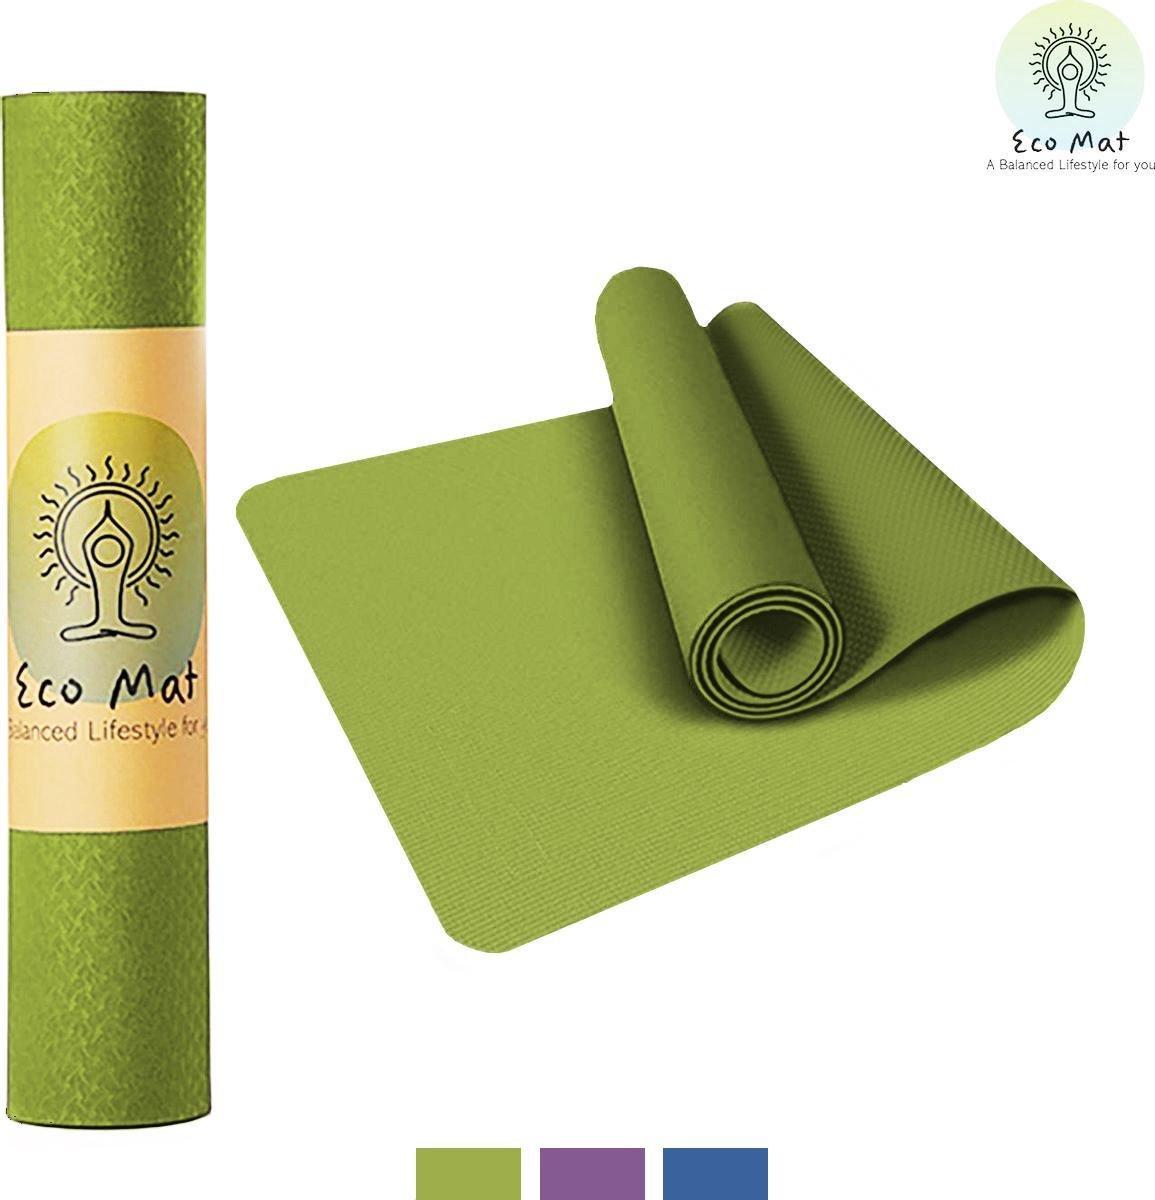 Eco Yoga Mat - Inclusief Draagriem - Anti Slip - Extra Dik (6 mm) - 61 x 183 x 0,6 cm - Zwart/Groen